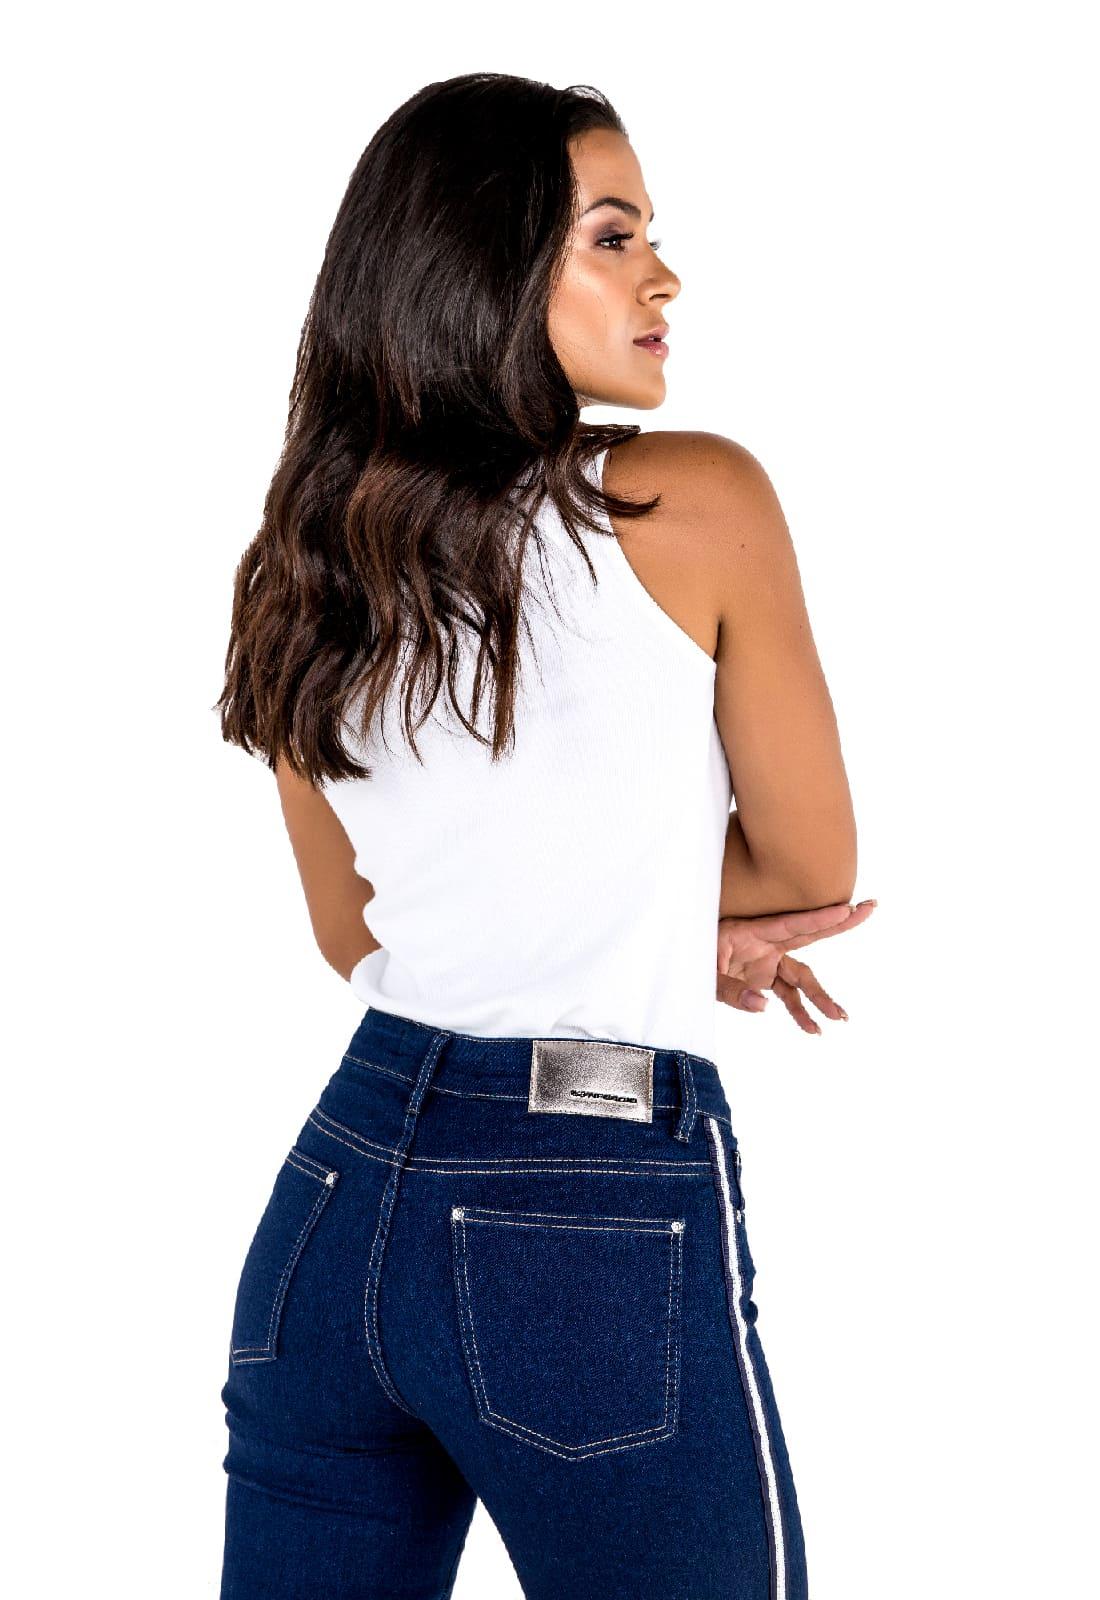 2 Blusas Feminina Latifundio Gola Alta -  Cores Branco e Preto